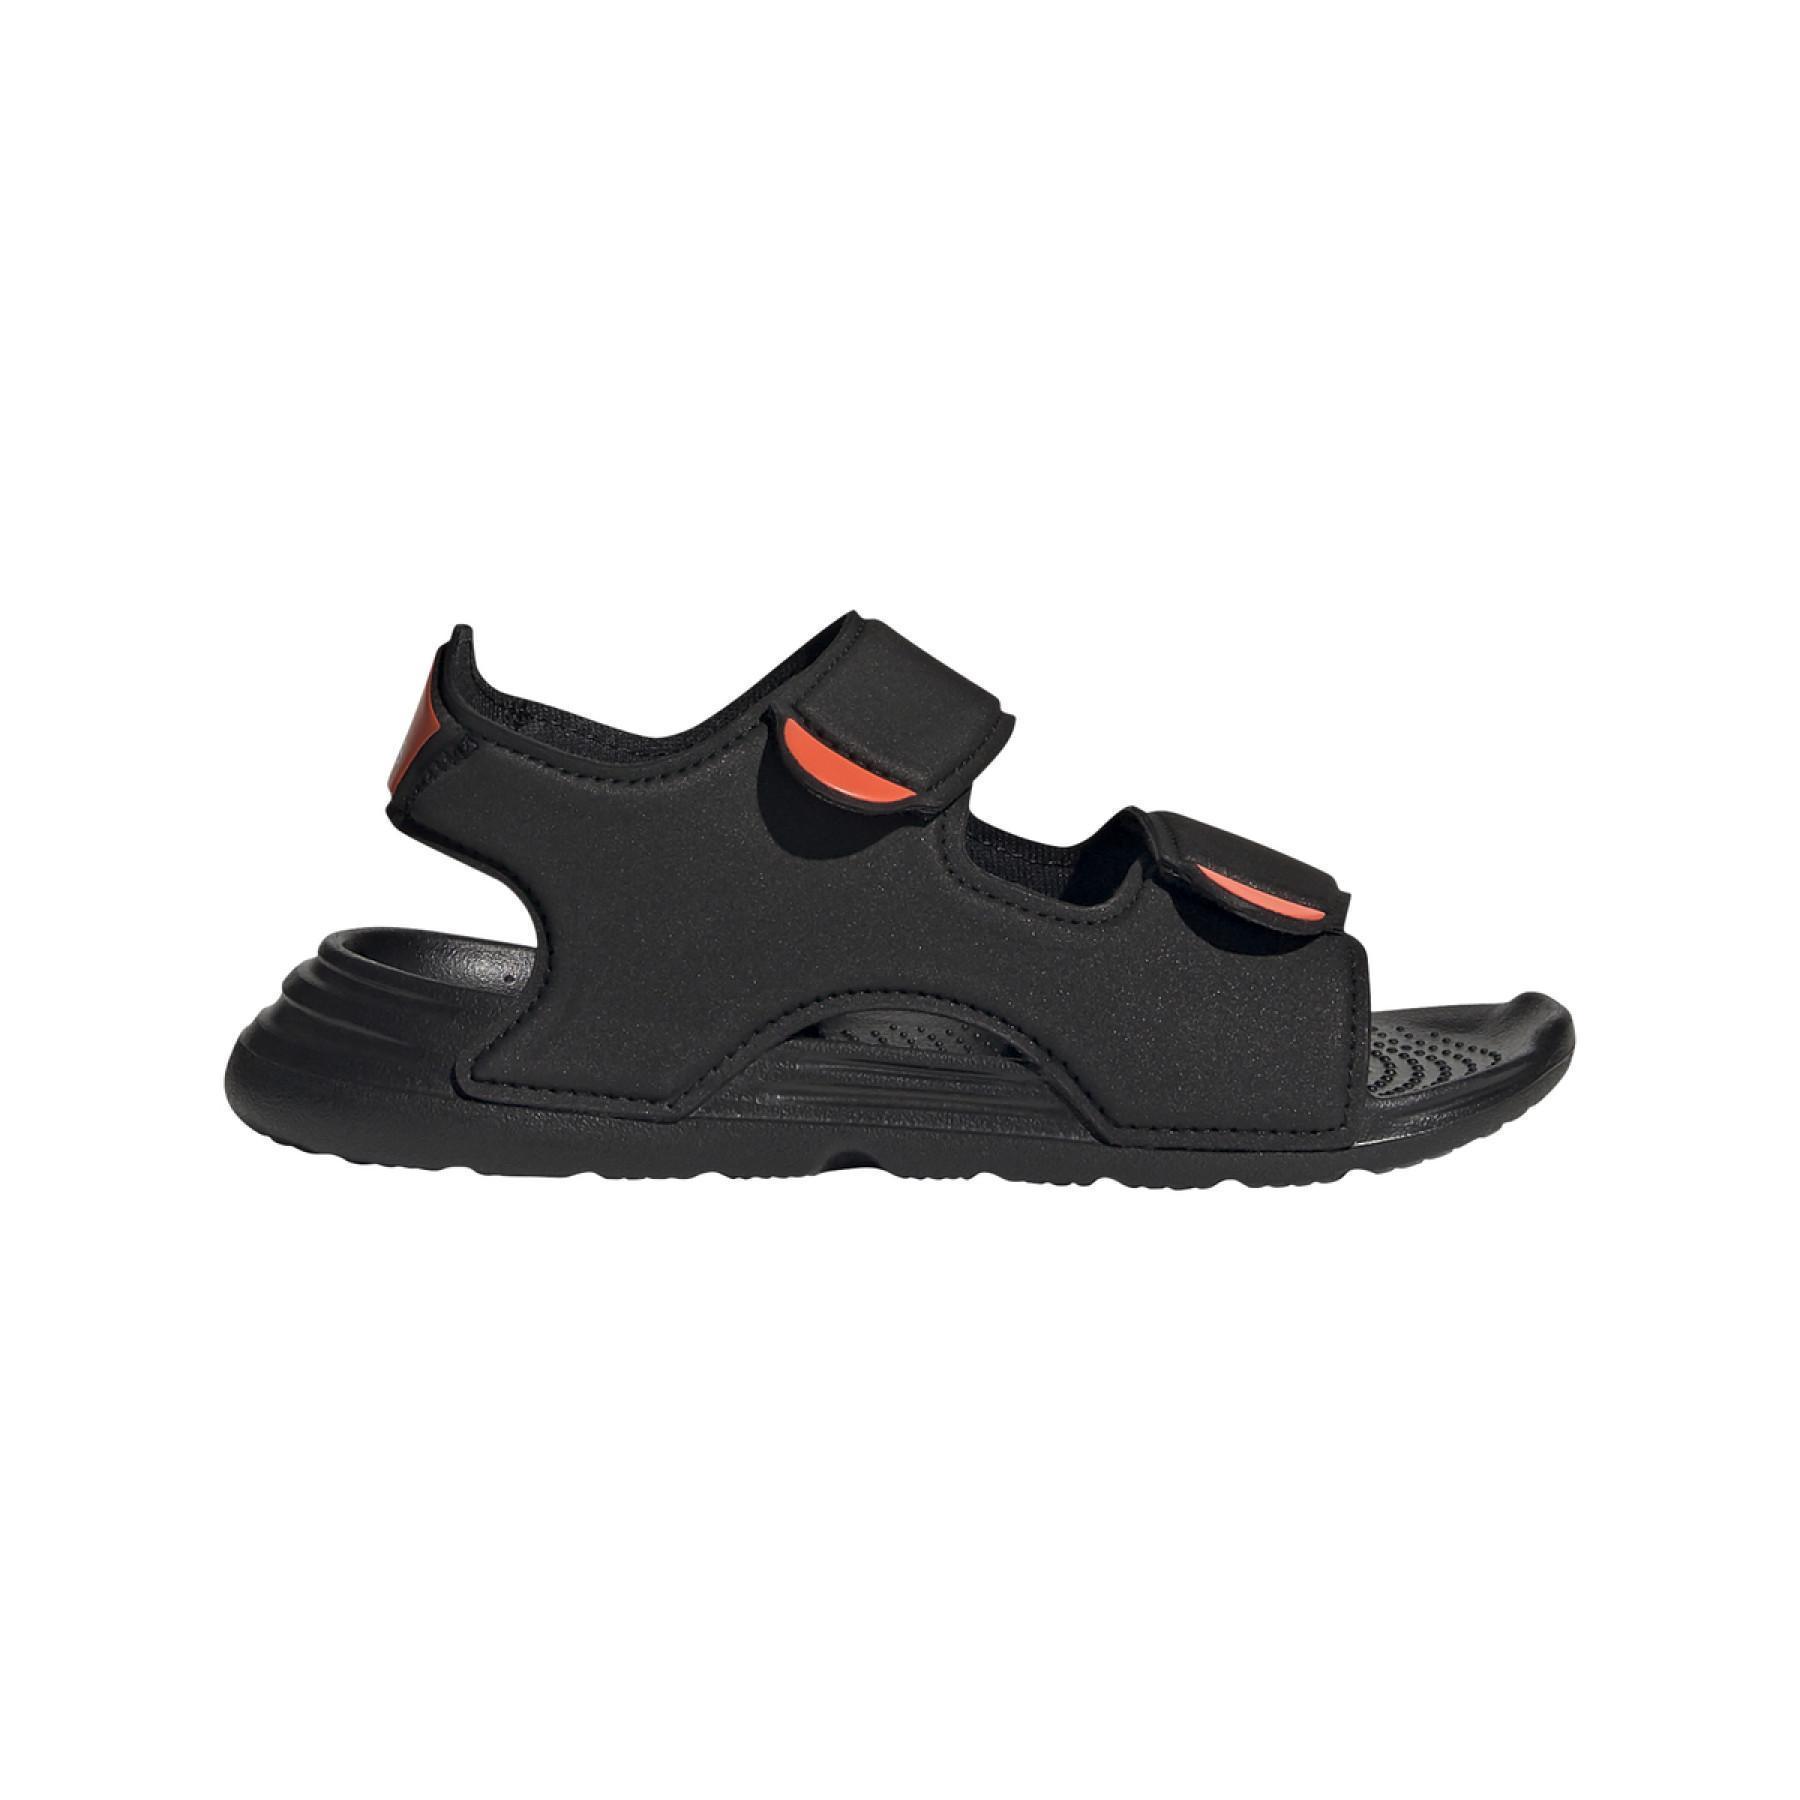 adidas Children's Sandals C